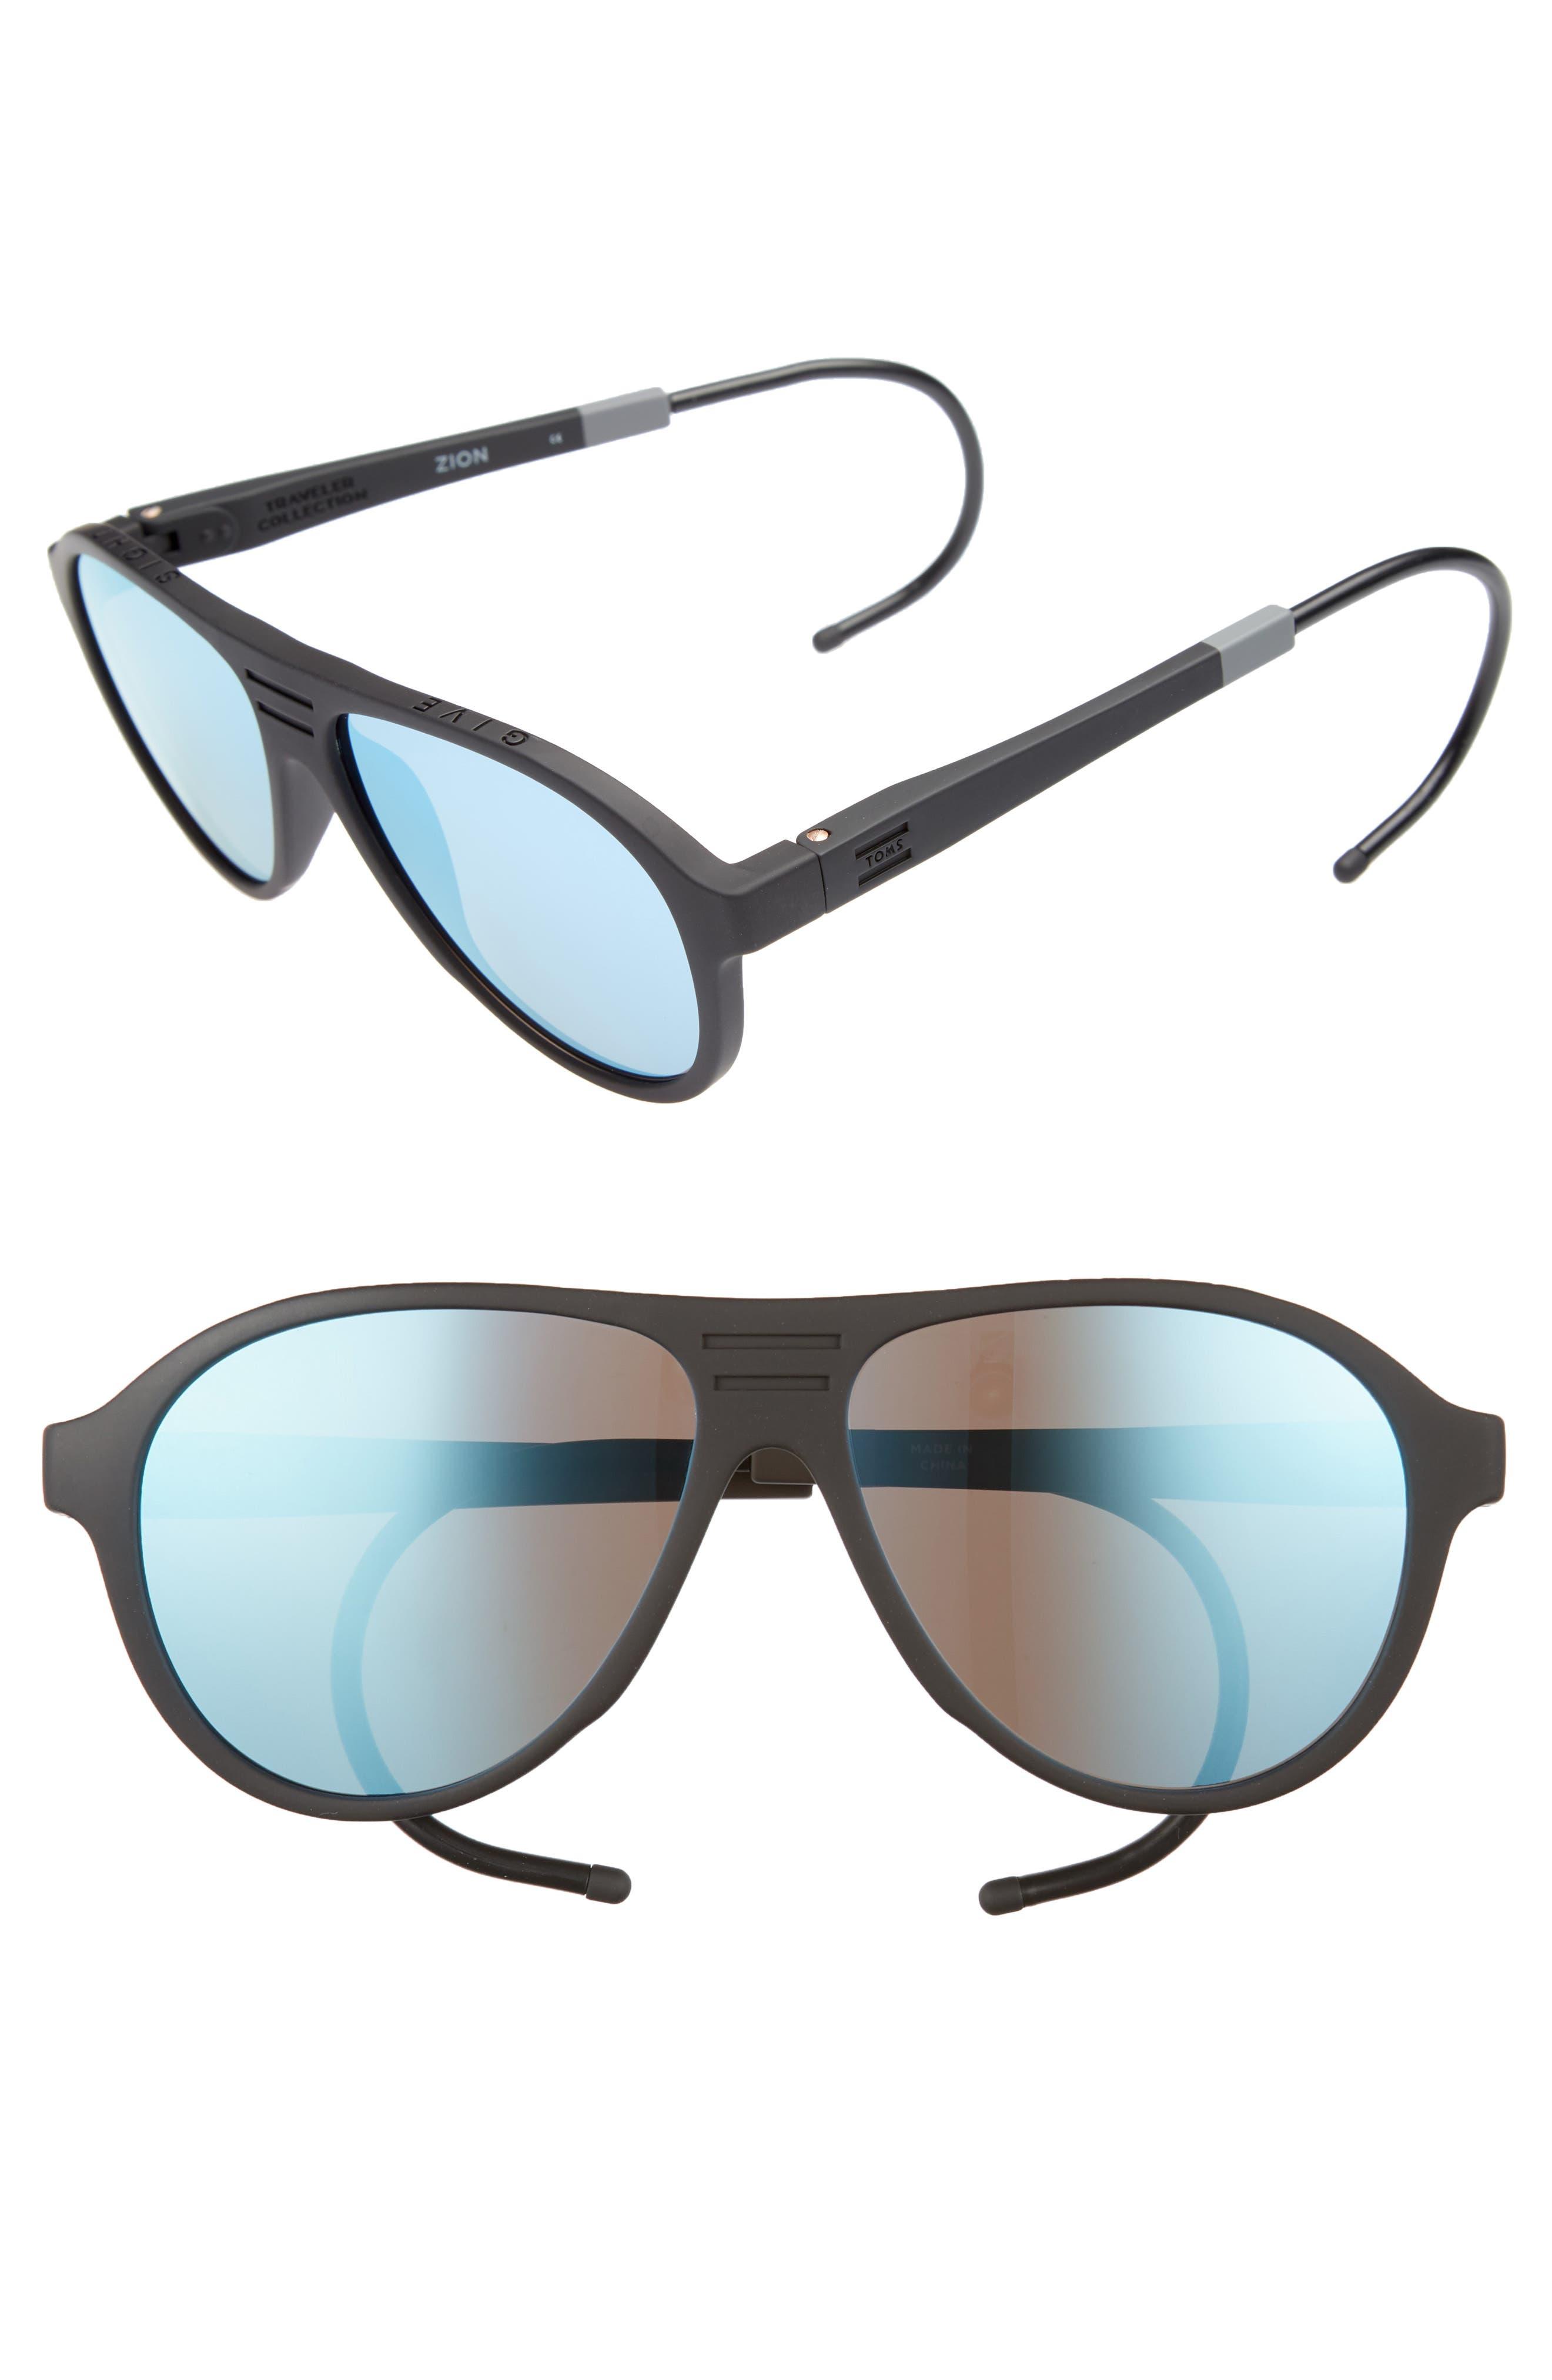 Traveler Zion 58mm Polarized Aviator Sunglasses,                         Main,                         color, Matte Black/ Blue Mirror